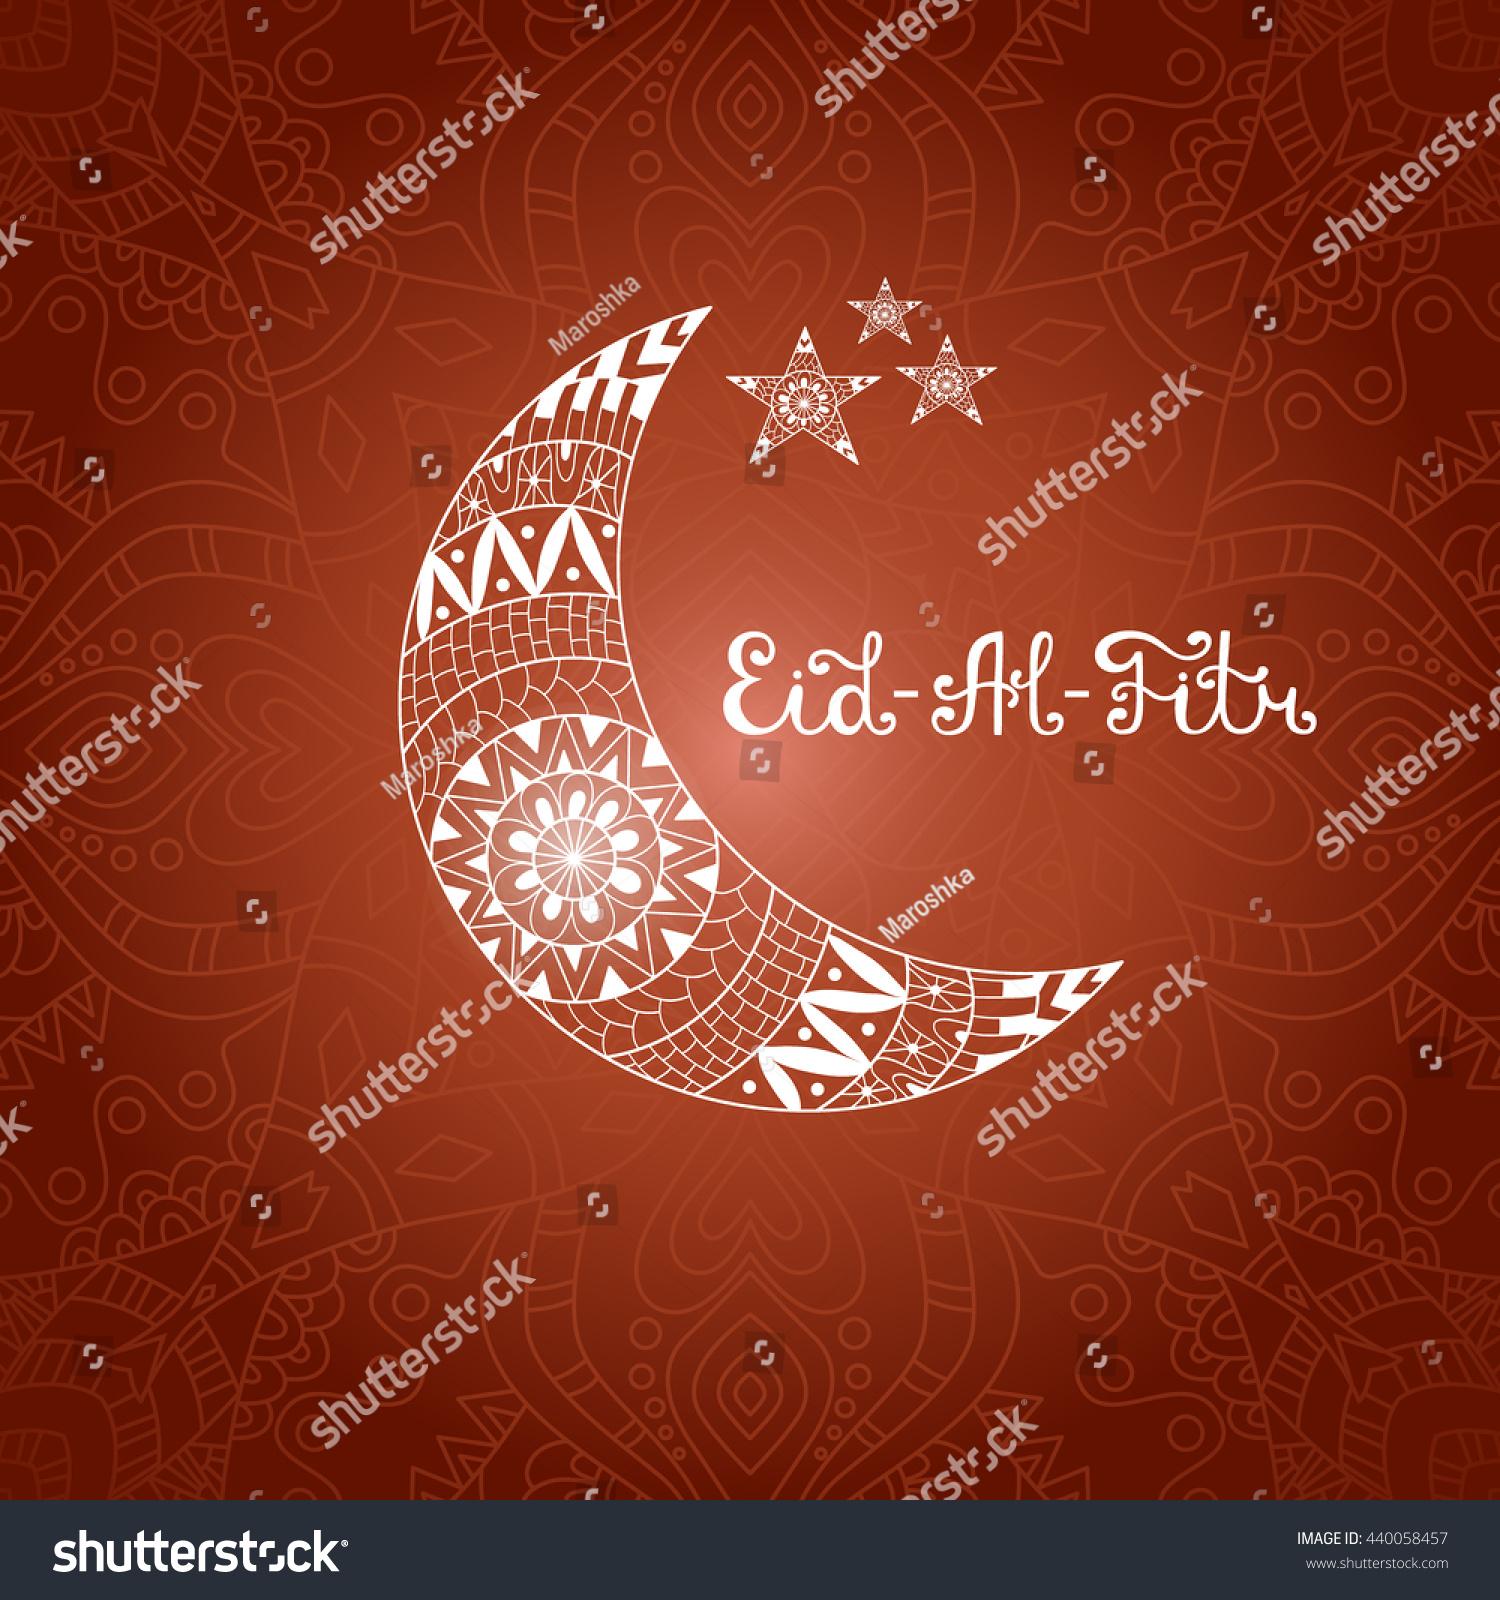 Cool Idd Eid Al-Fitr Greeting - stock-vector-vector-illustration-eid-al-fitr-greeting-card-with-ornamental-crescent-moon-and-stars-on-arabic-440058457  Graphic_861528 .jpg